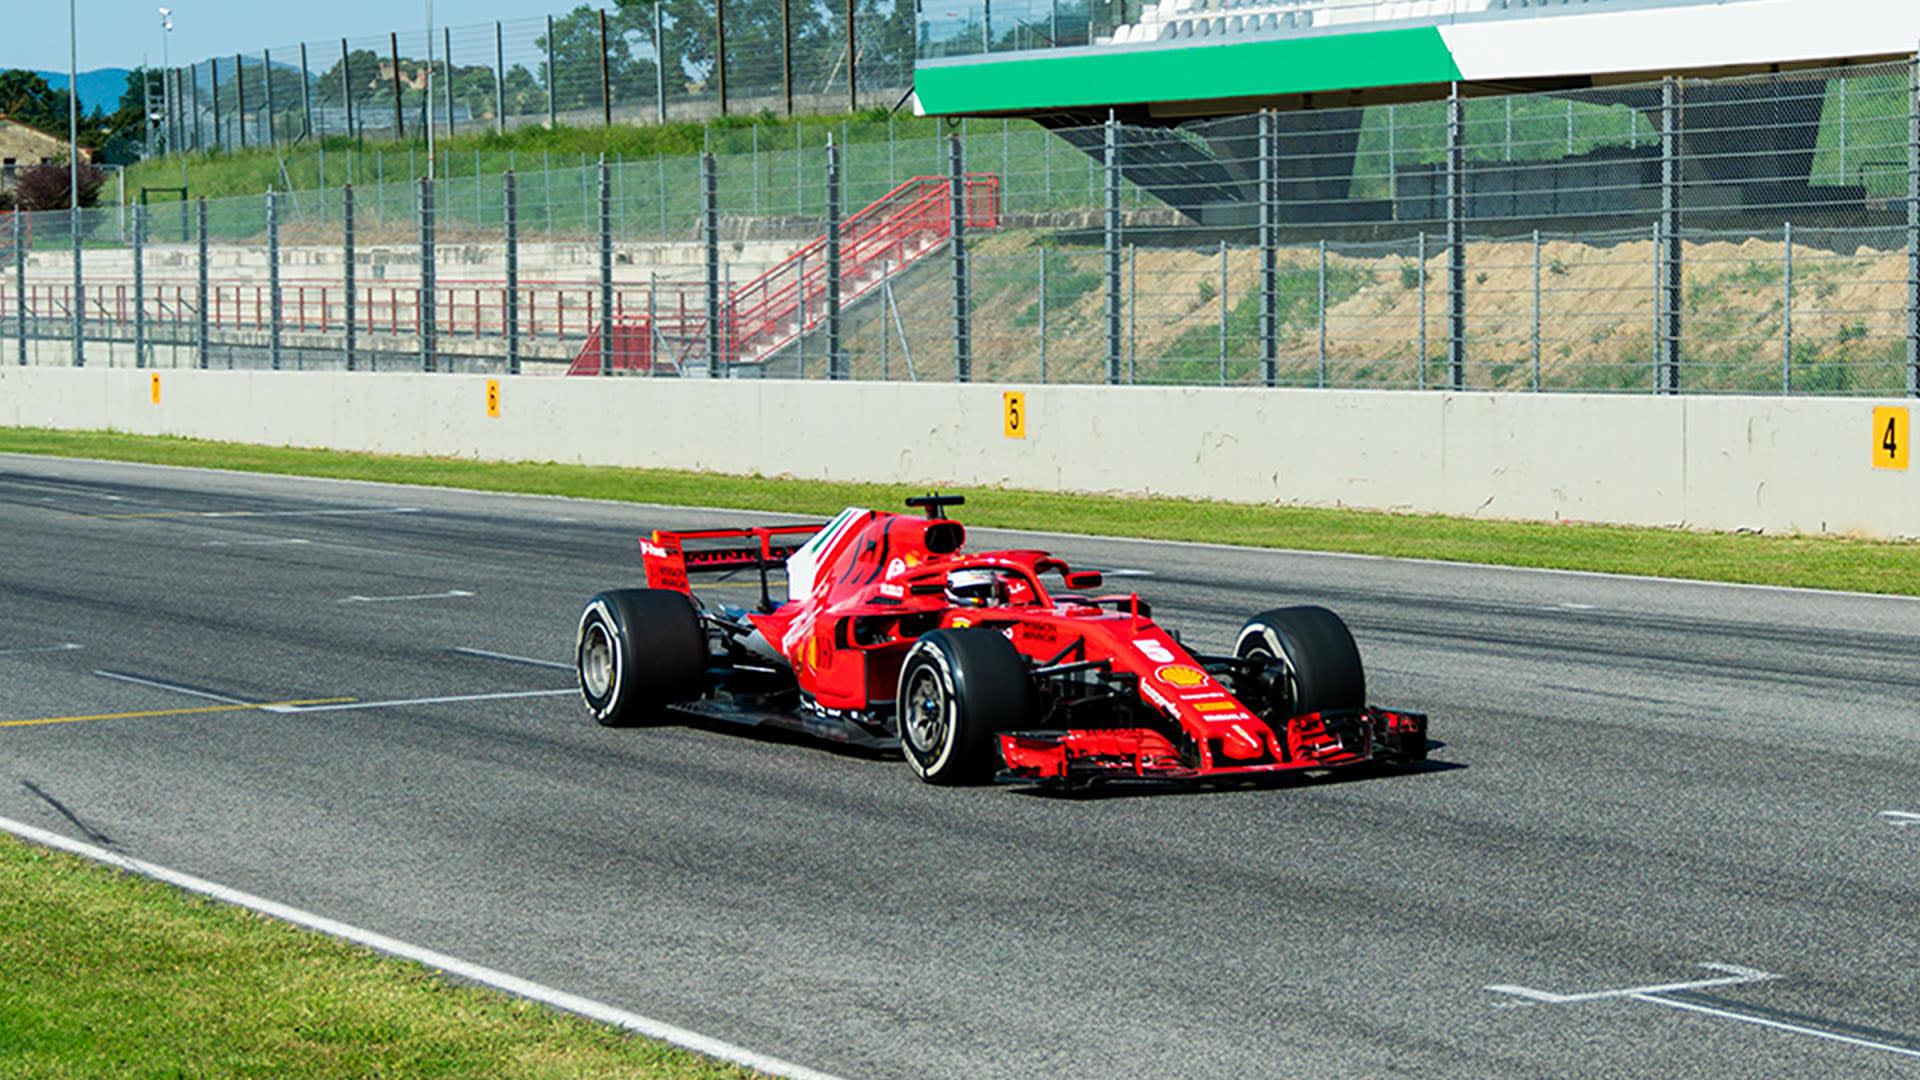 'Spectacular' Mugello deserves to host a Grand Prix, says Vettel after Ferrari test run   Formula 1®